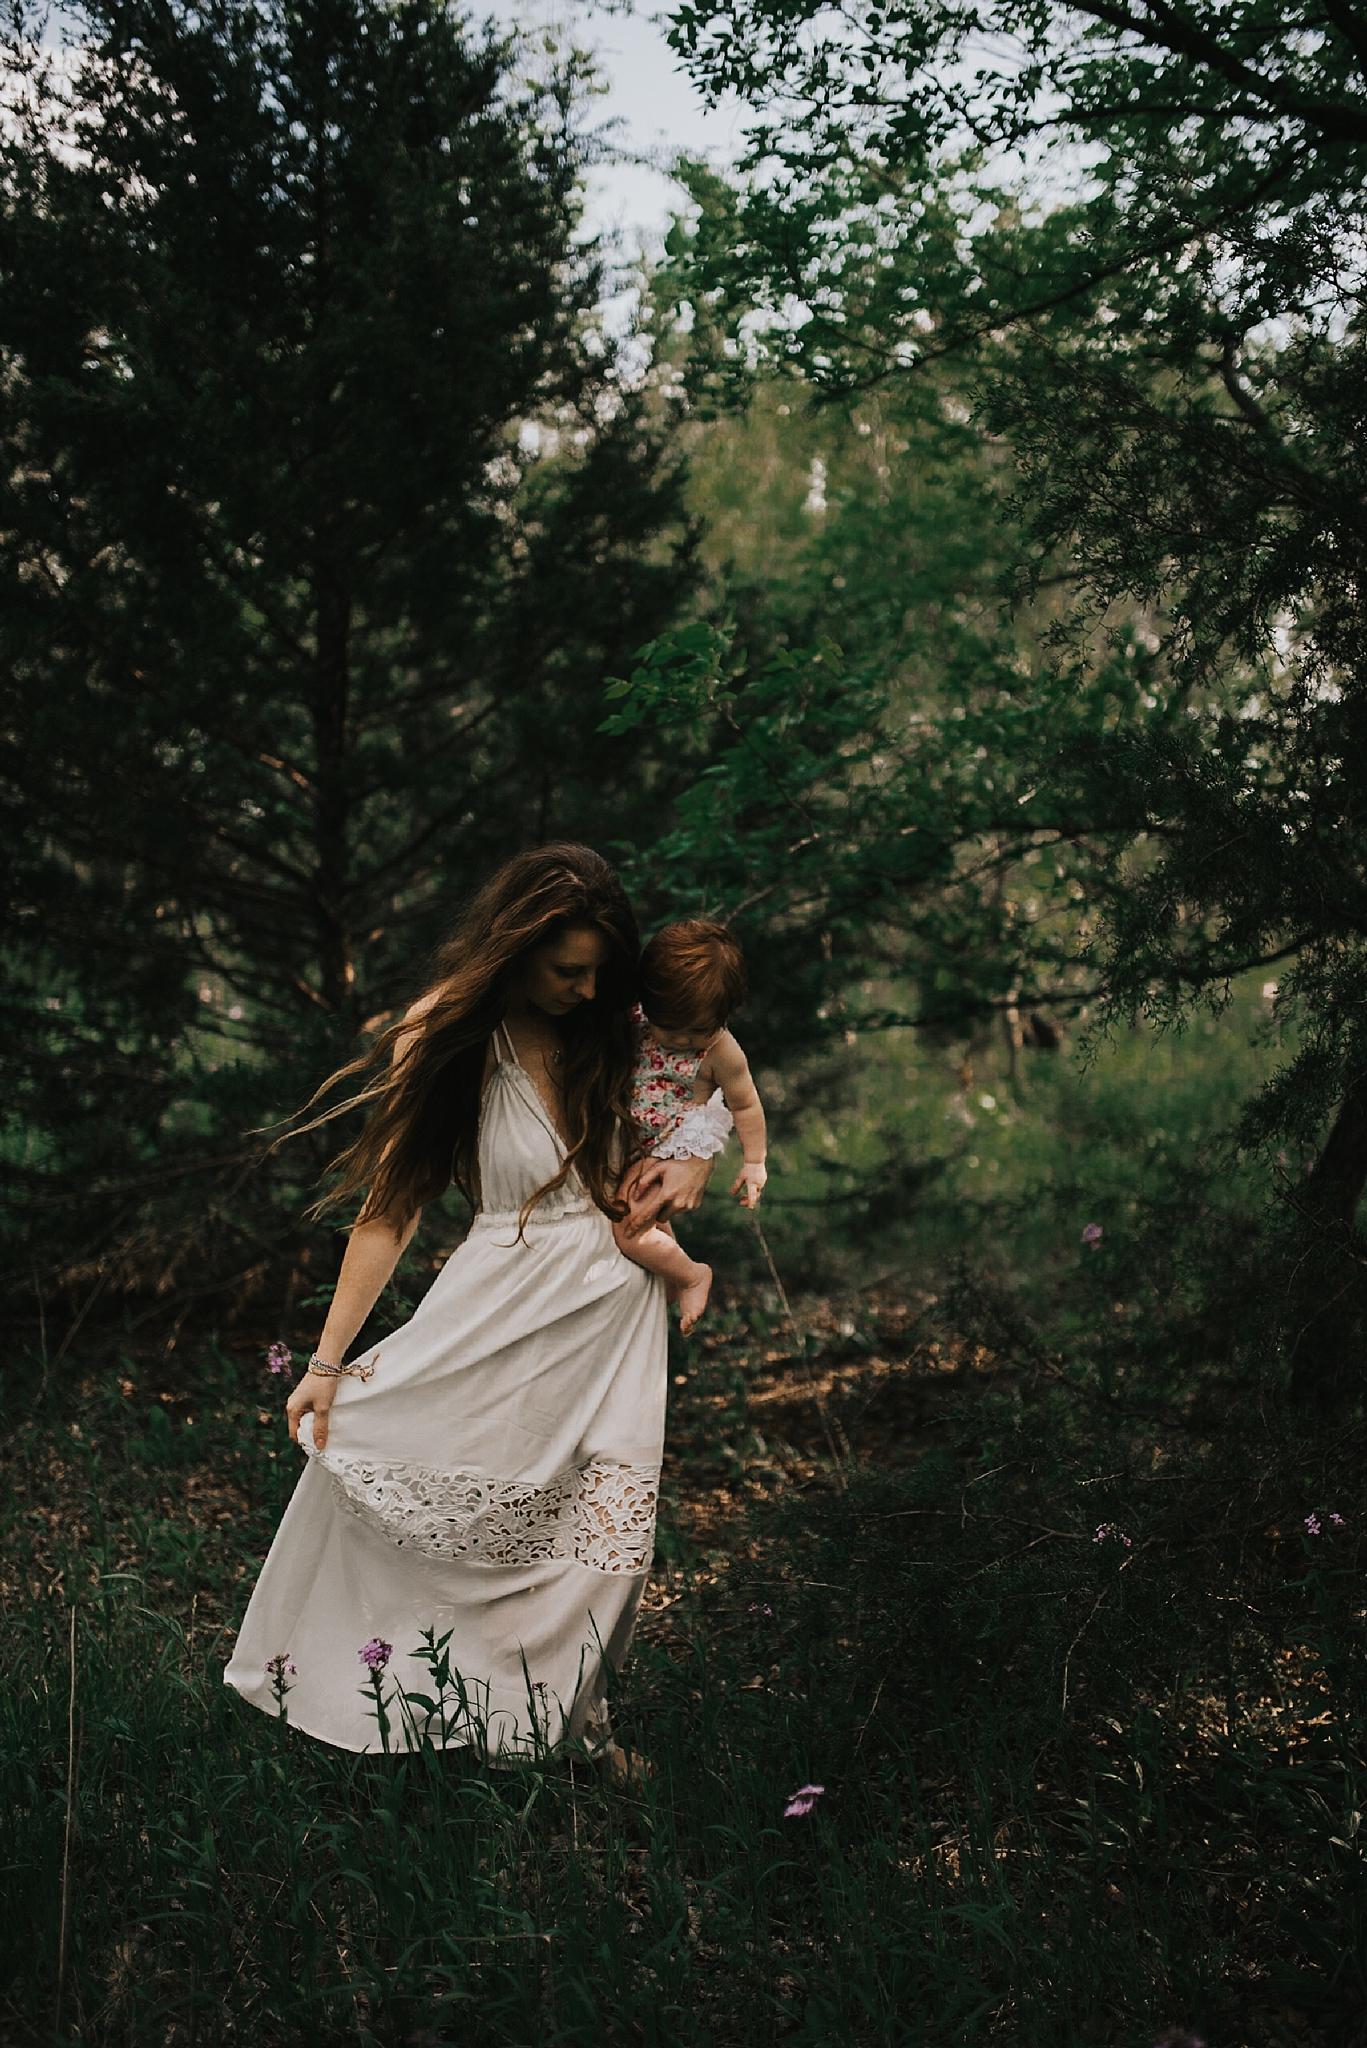 twyla jones photography - mother daughter - field and forest-4206_treasure coast florida.jpg